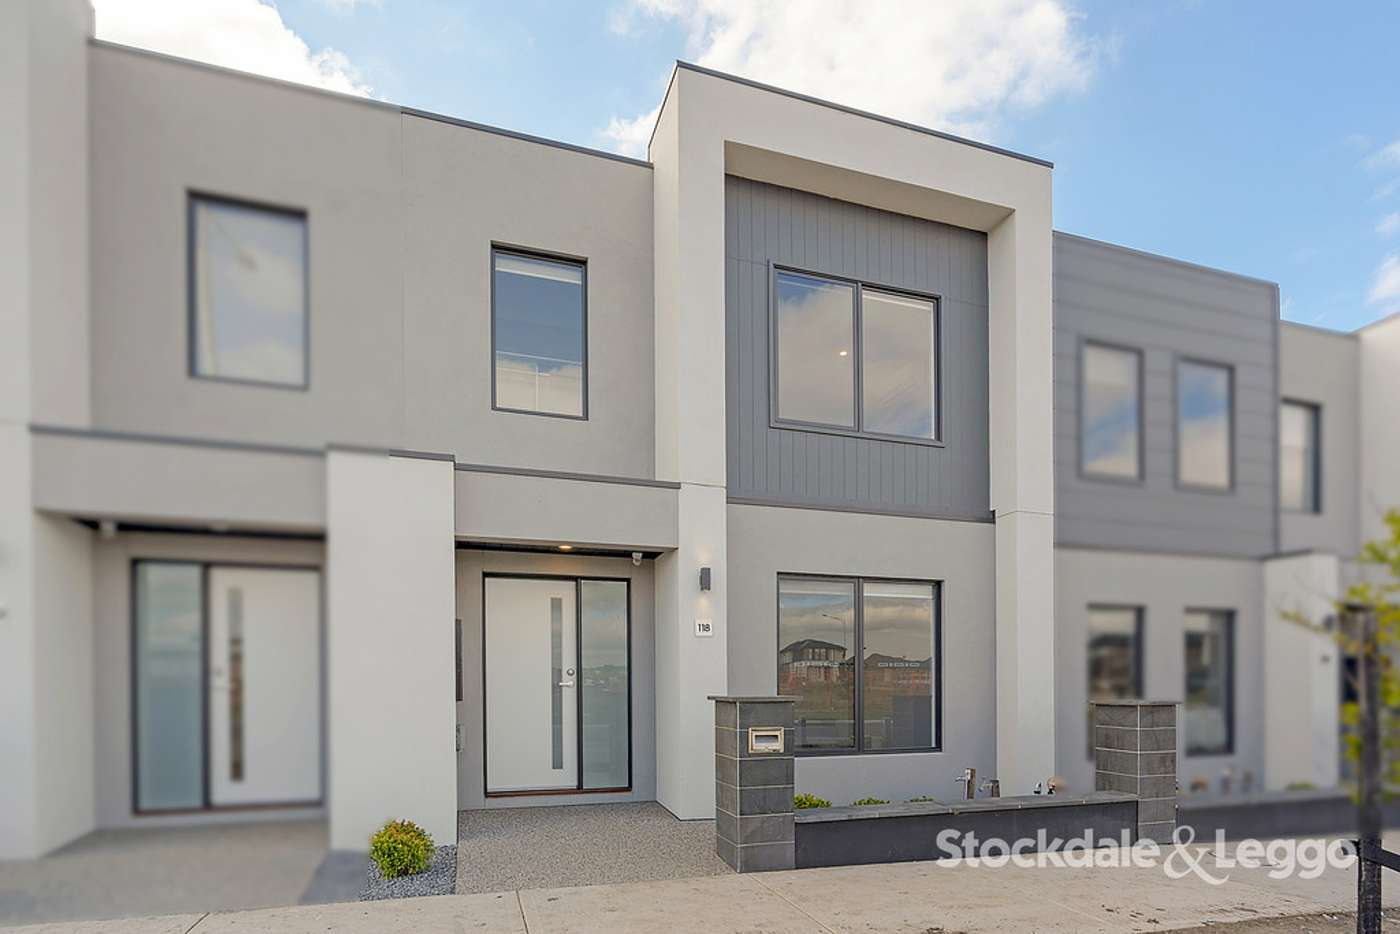 Main view of Homely house listing, 118 Highlander Drive, Craigieburn VIC 3064